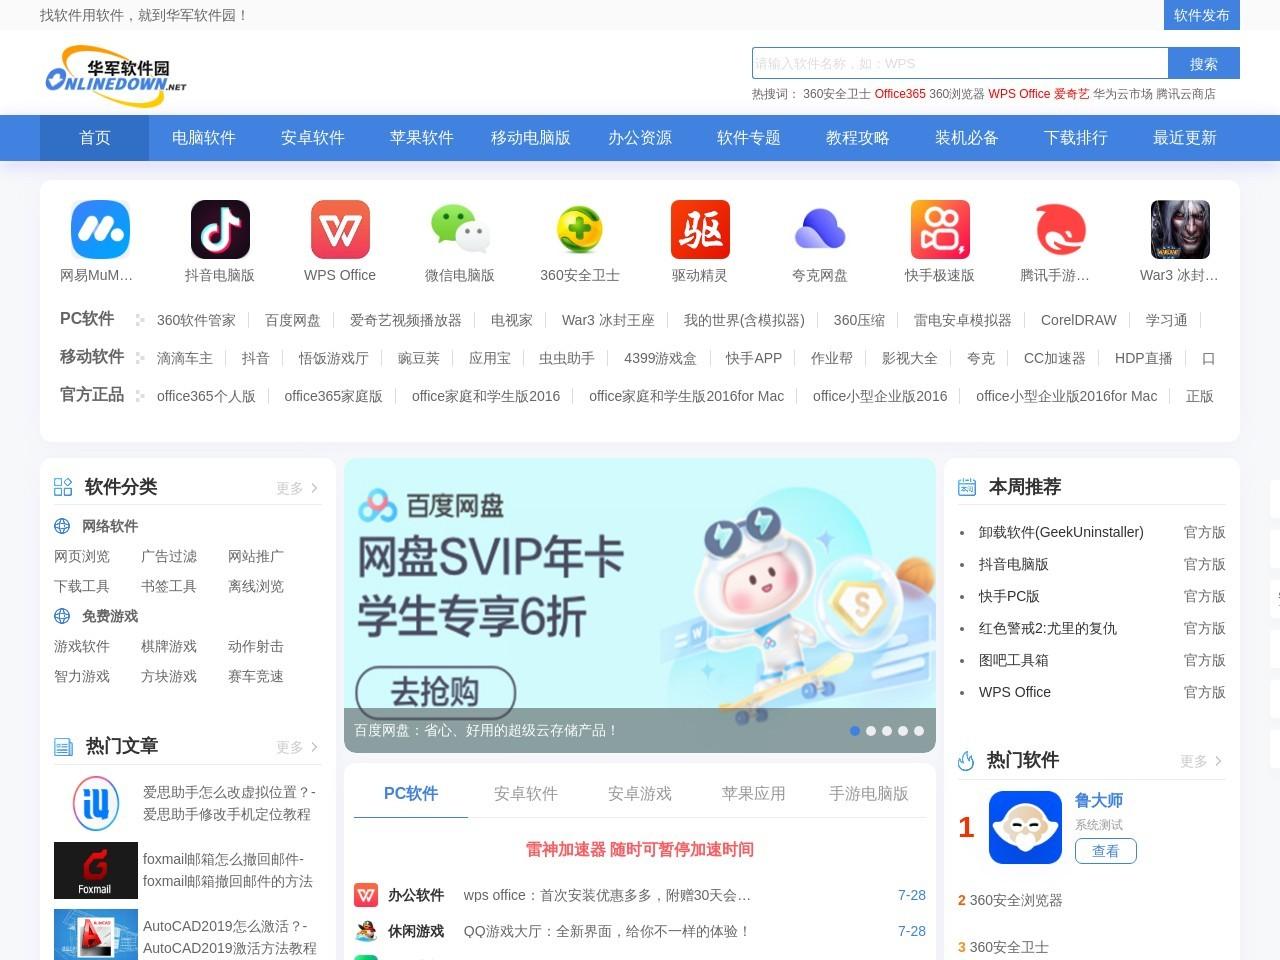 P2POver下载-P2POver官方版下载[上网辅助]-华军软件园